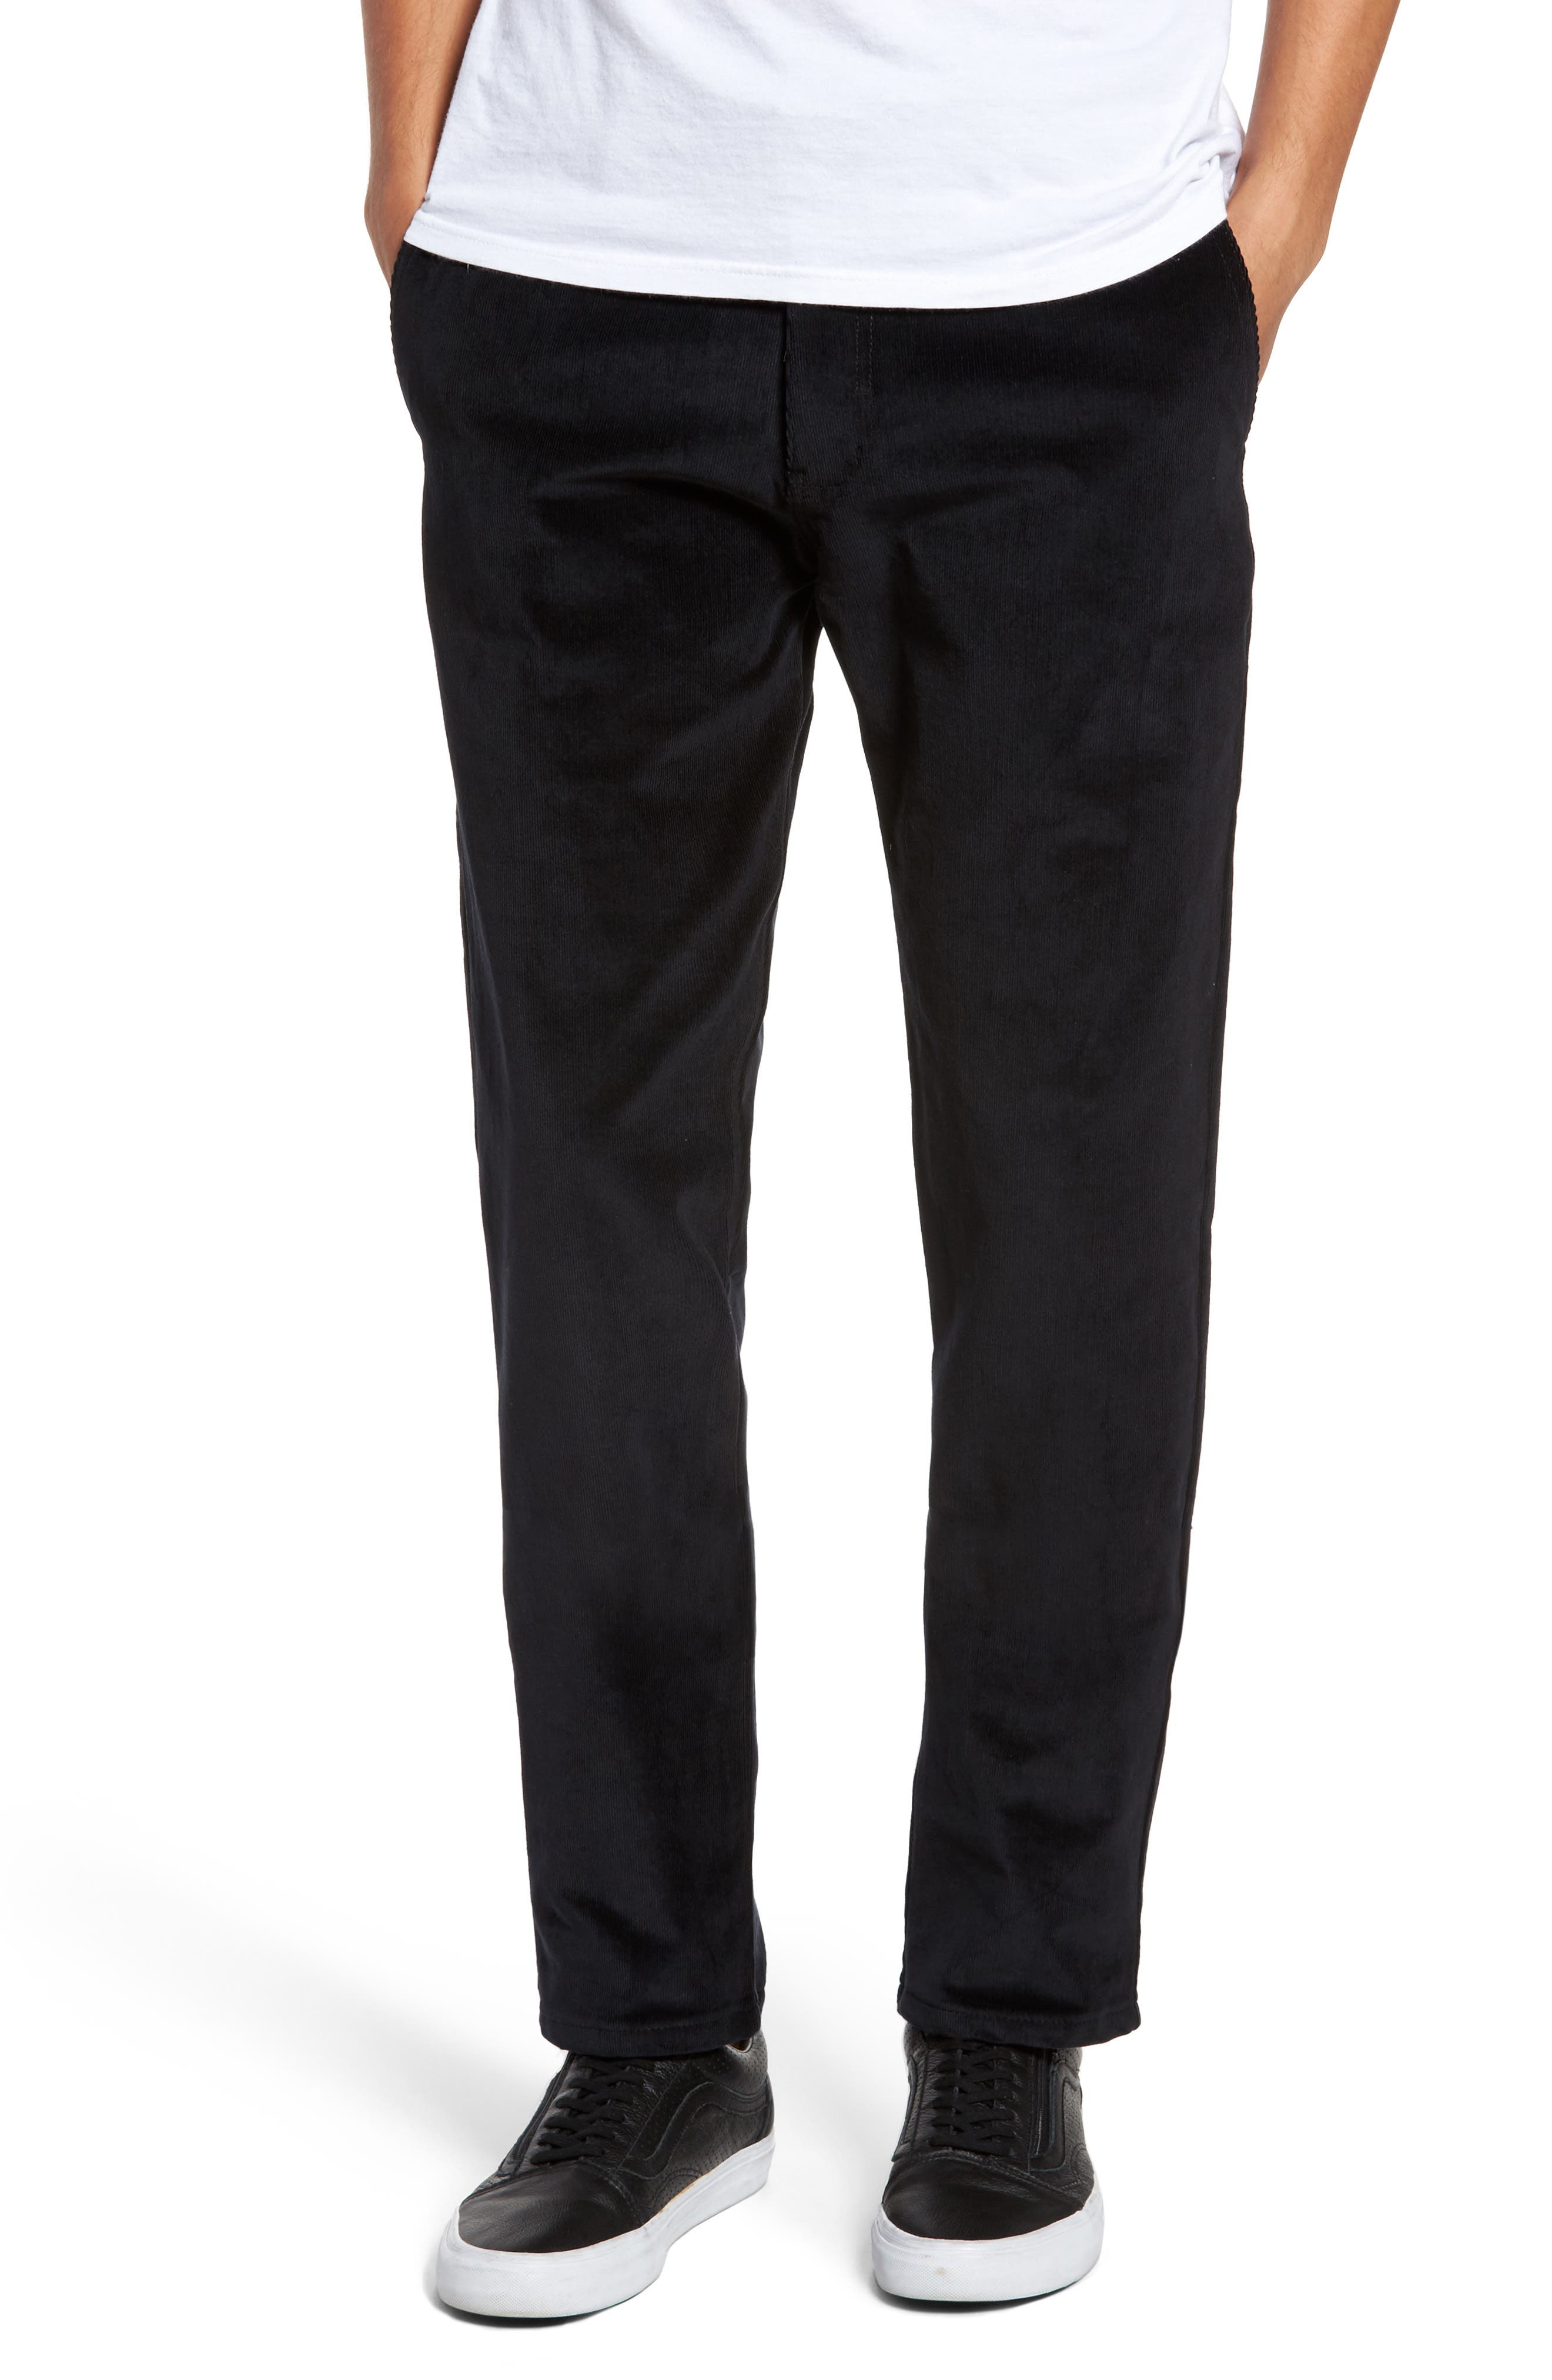 Naked & Famous Slim Chino Slim Fit Corduroy Pants,                         Main,                         color, Black